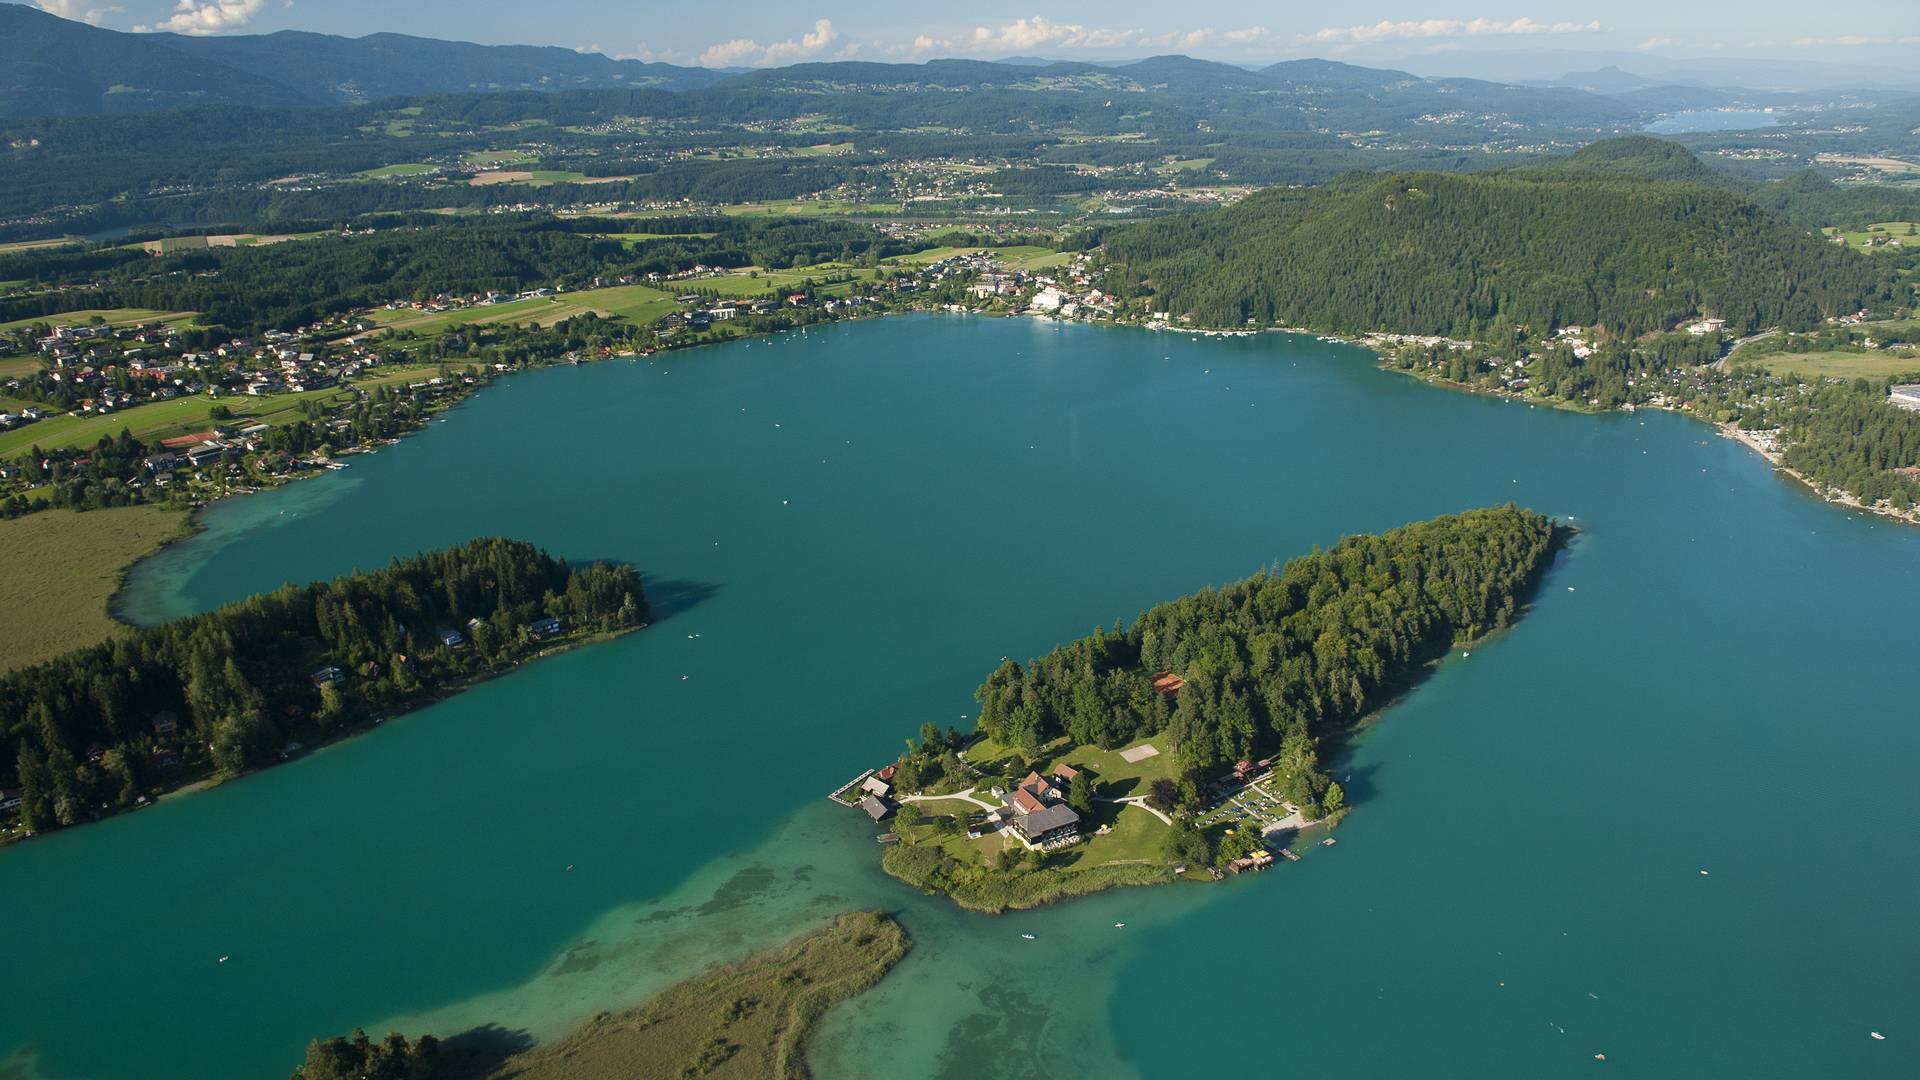 Blick auf den Faaker See